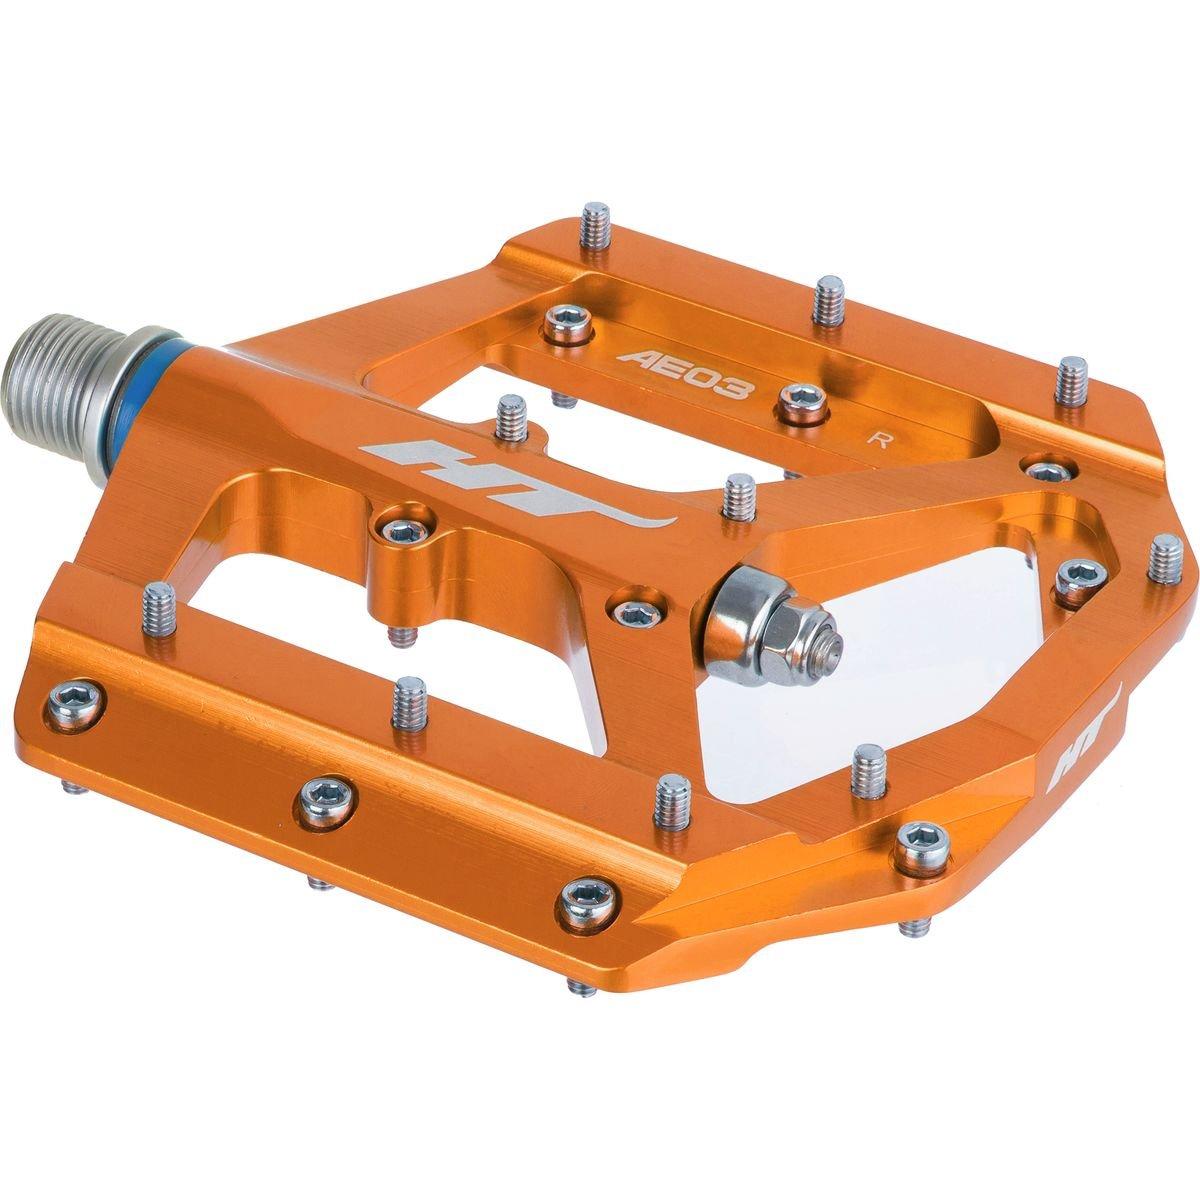 HT Components ae05 Evoペダル B072C8552Y One Size|オレンジ オレンジ One Size